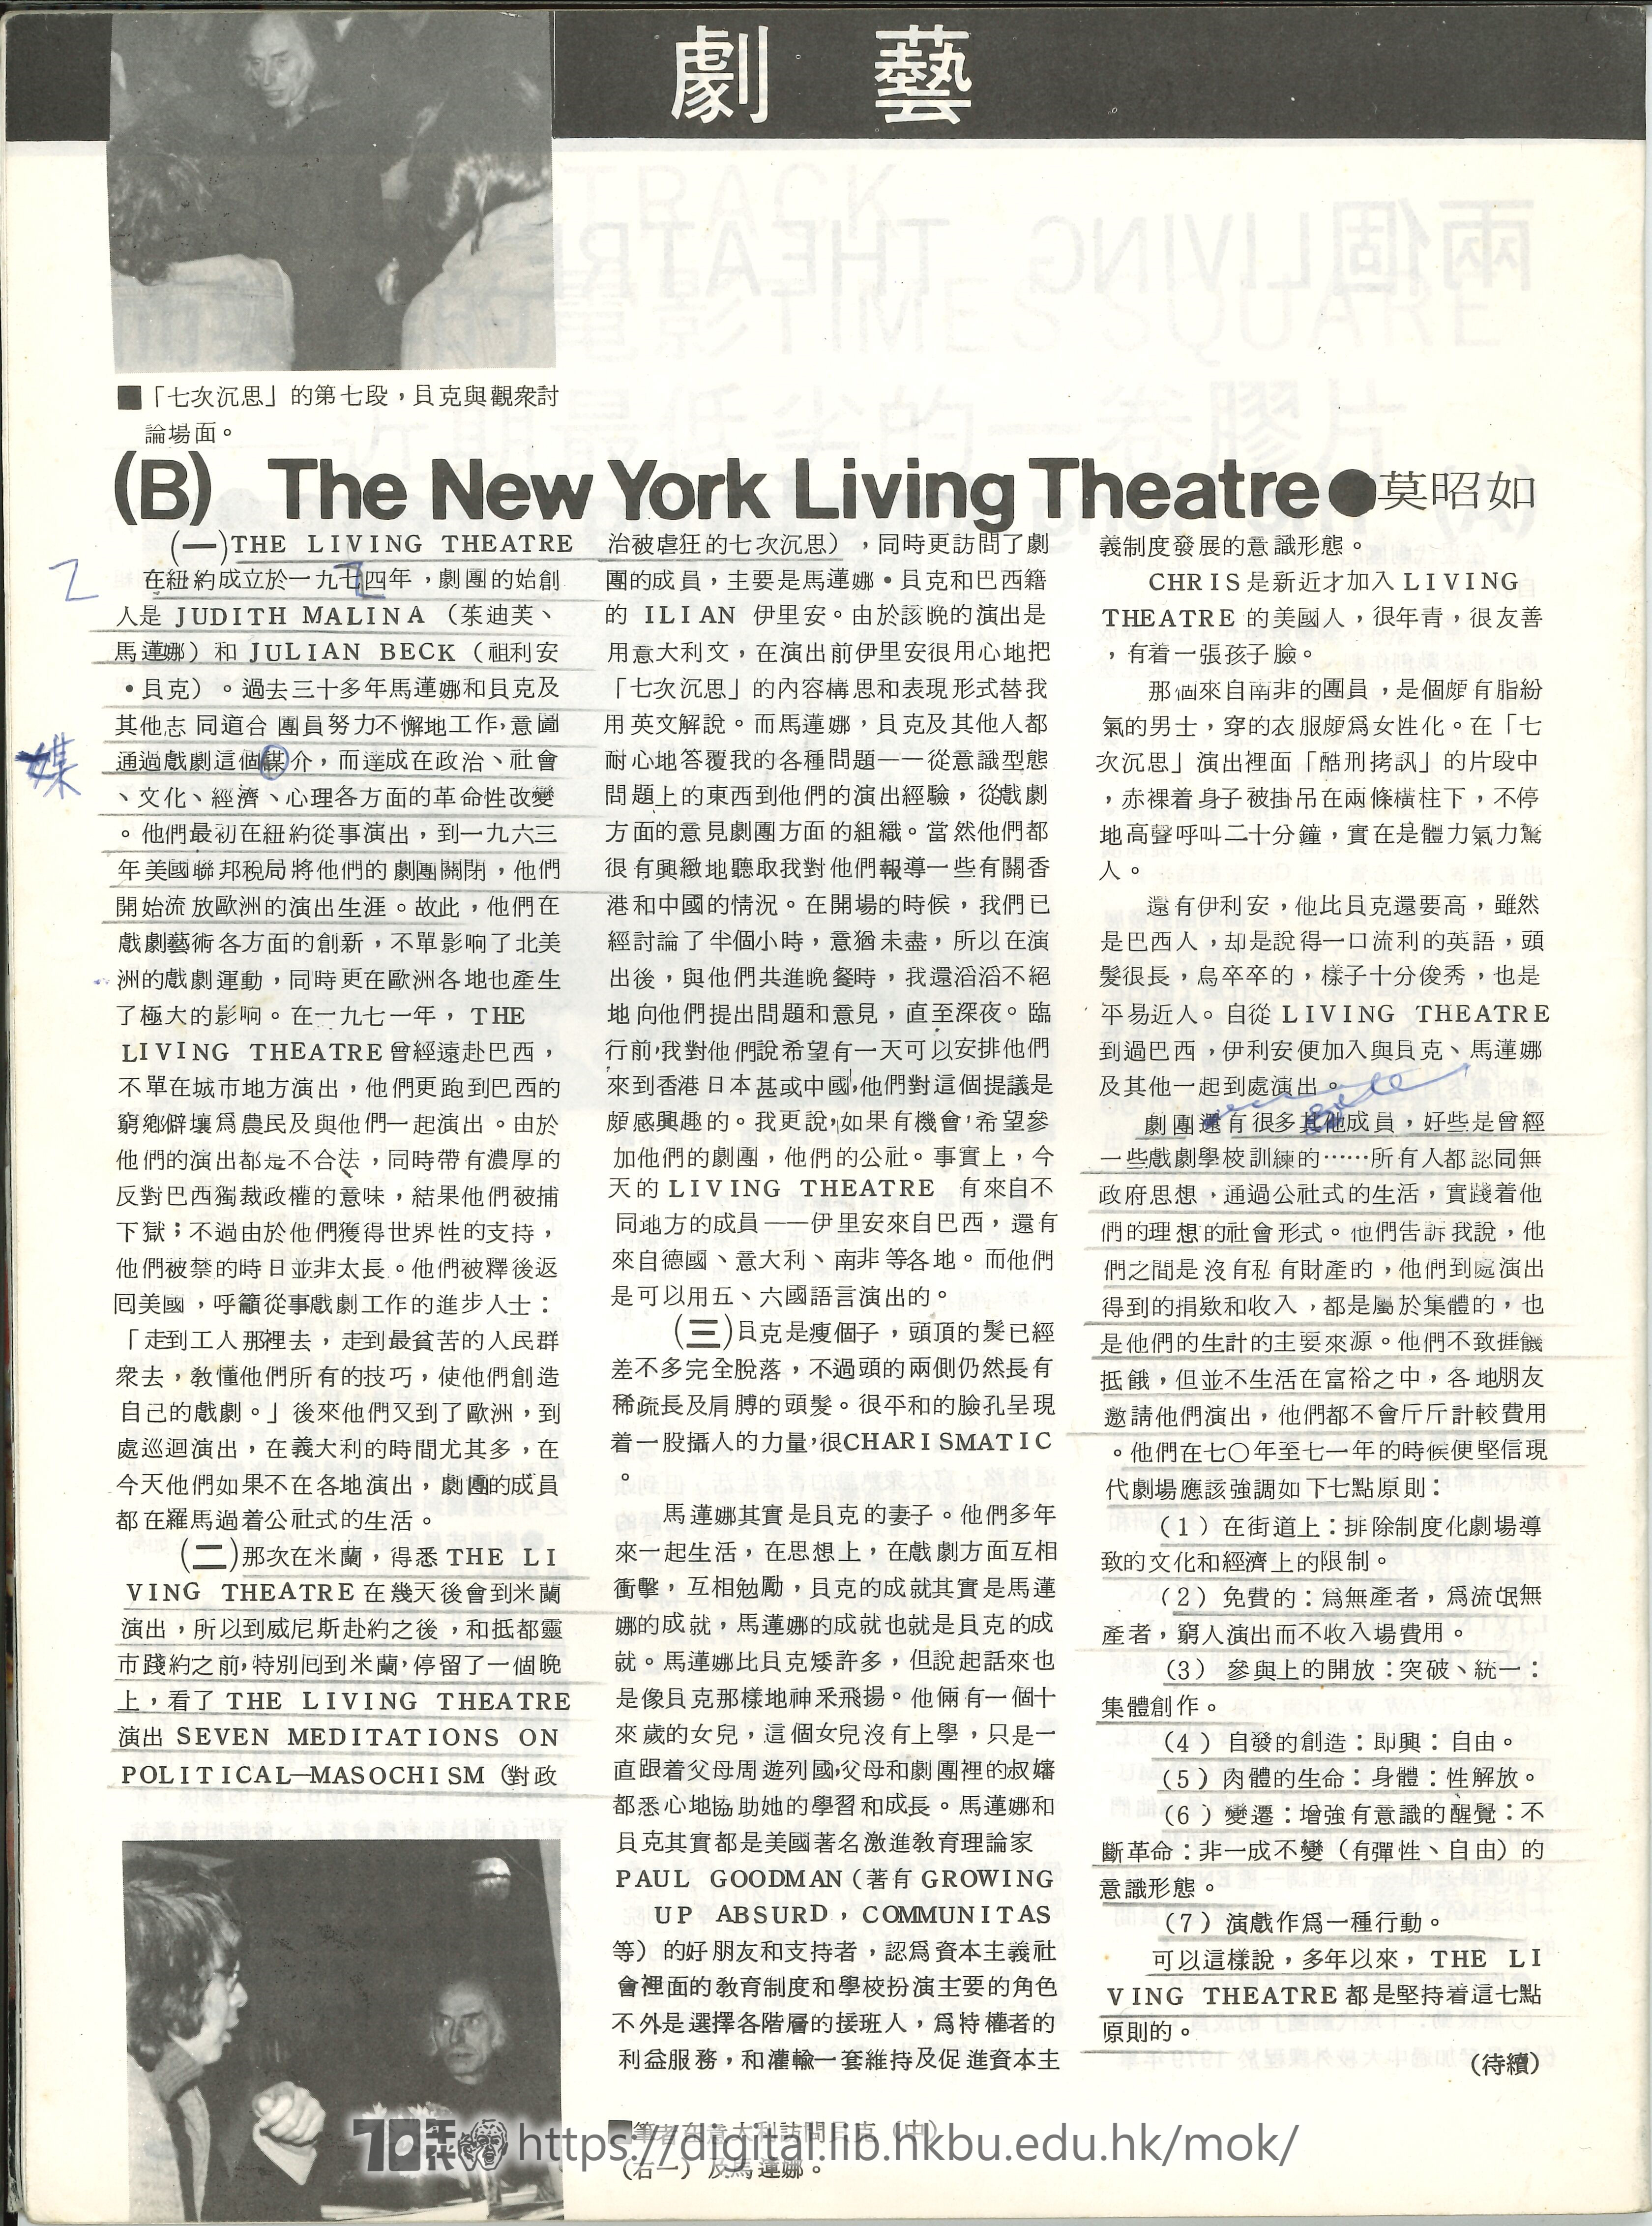 (B) The New York Living Theatre MOK, Chiu Yu